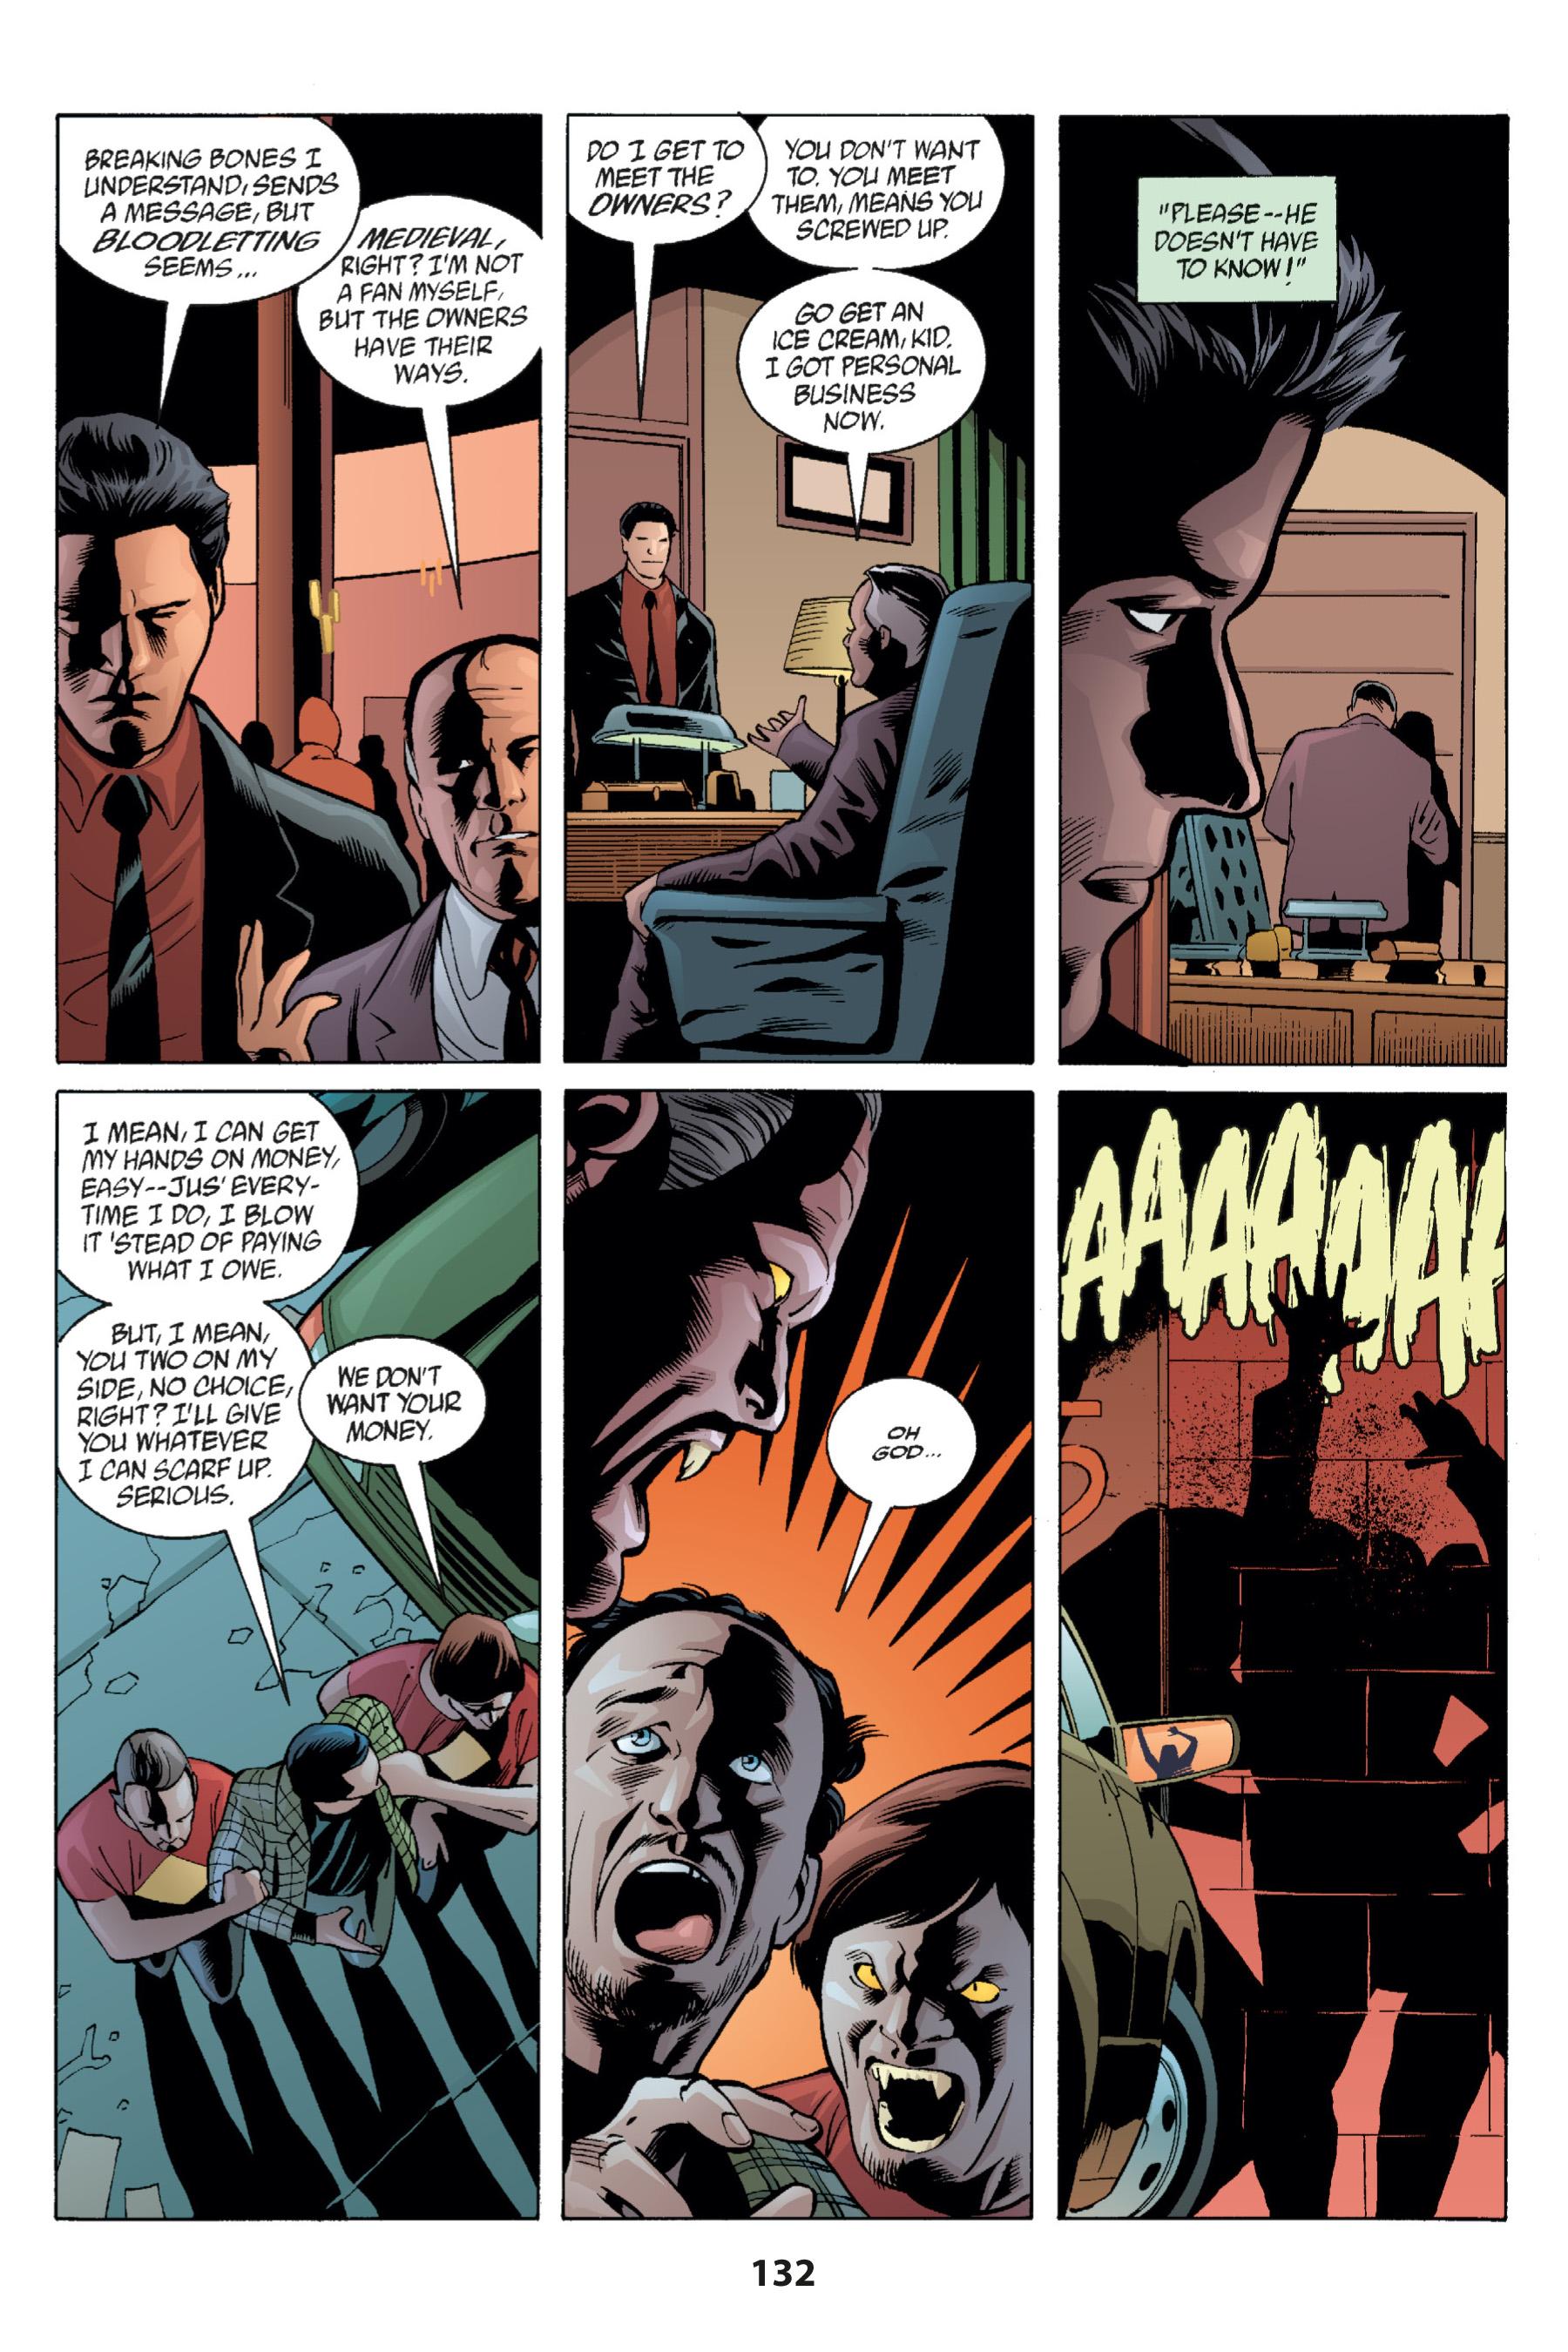 Read online Buffy the Vampire Slayer: Omnibus comic -  Issue # TPB 1 - 131